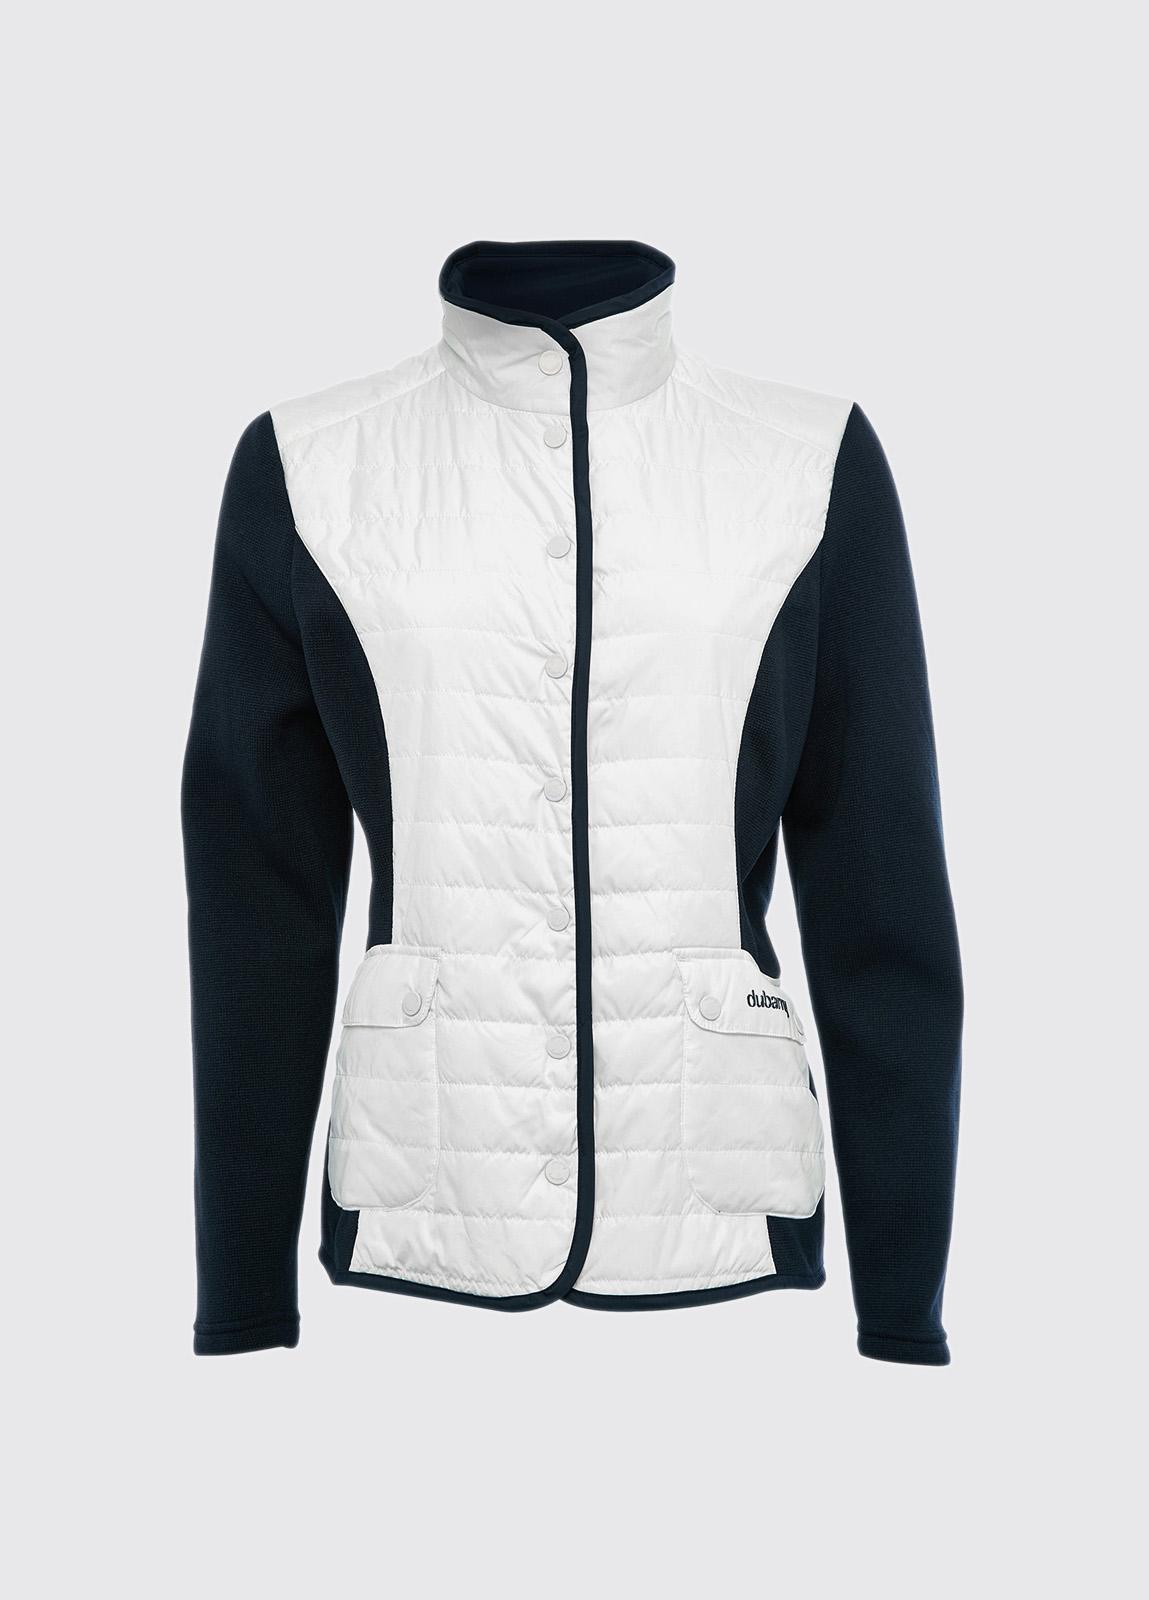 Terryglass jacket - S-W Multi